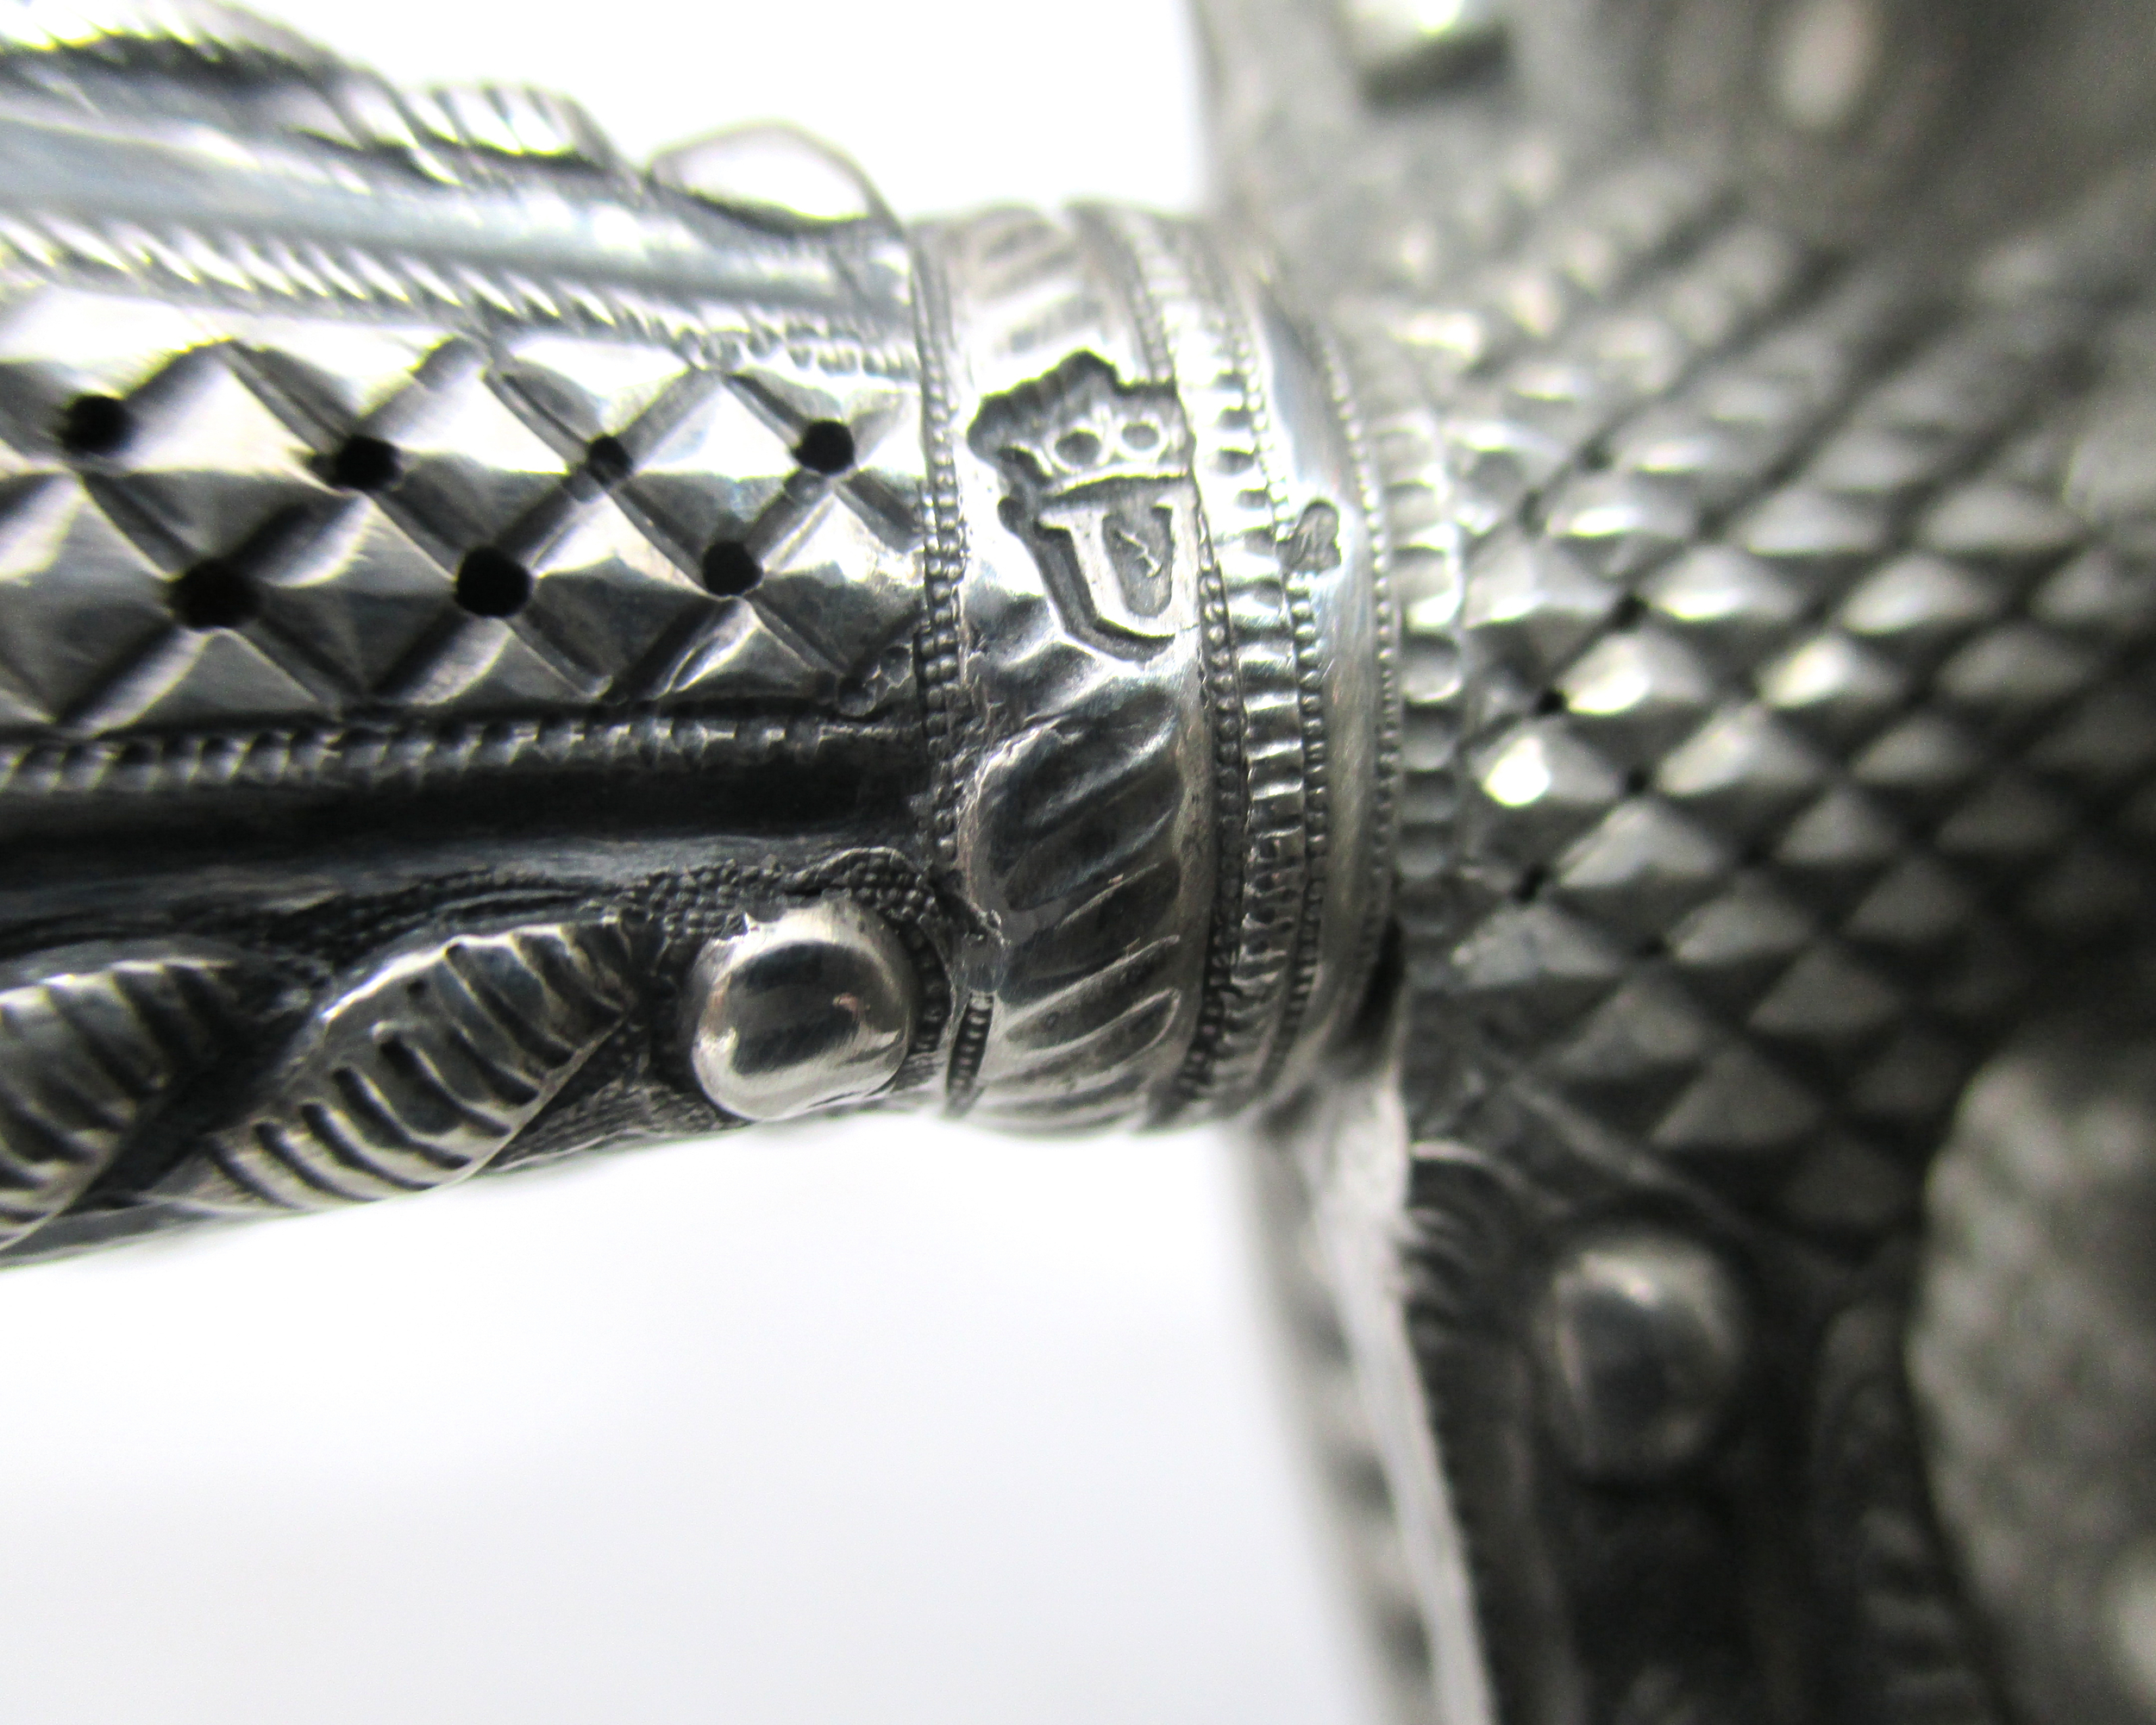 french-silver-hilt-sword-weapon-18thcentury-gary-friedland-arms-armor-6.jpg